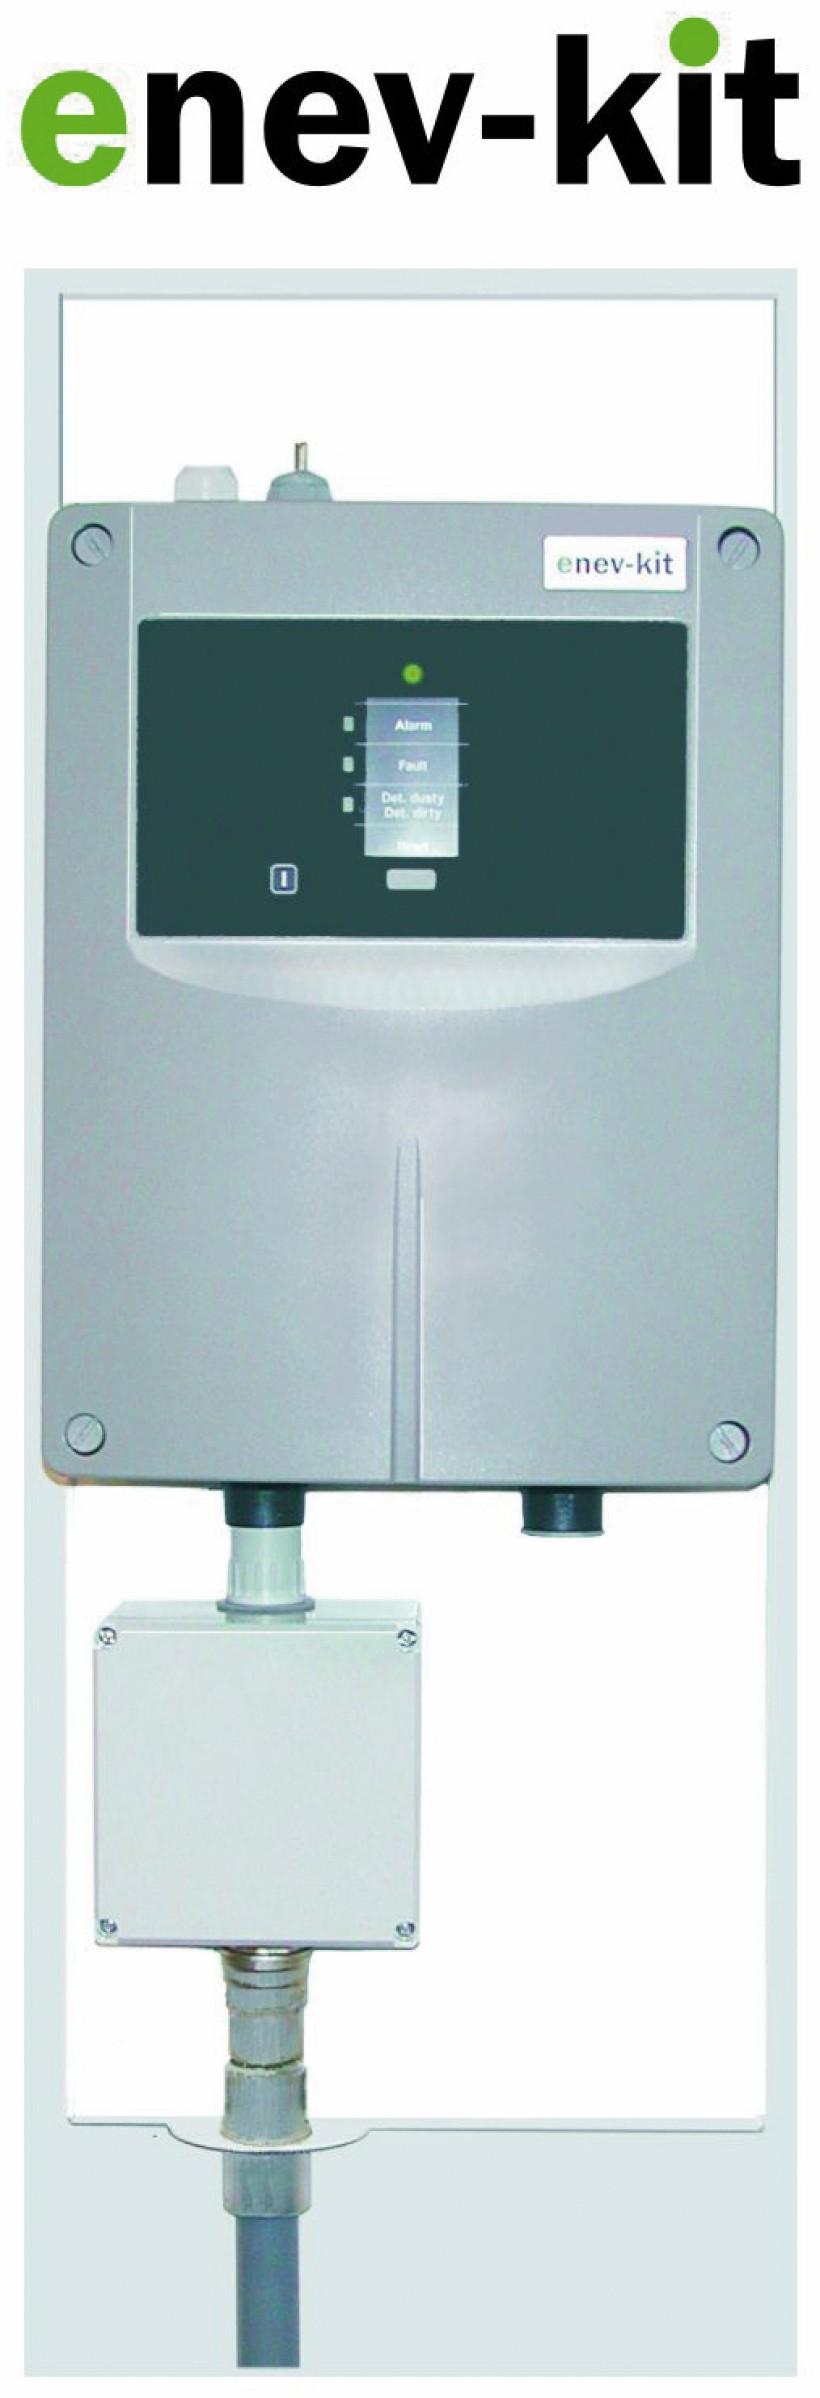 Permanente Luftüberwachung im Fahrschacht über den CO2-Sensor enev-kit. Bild: Aleatec GmbH